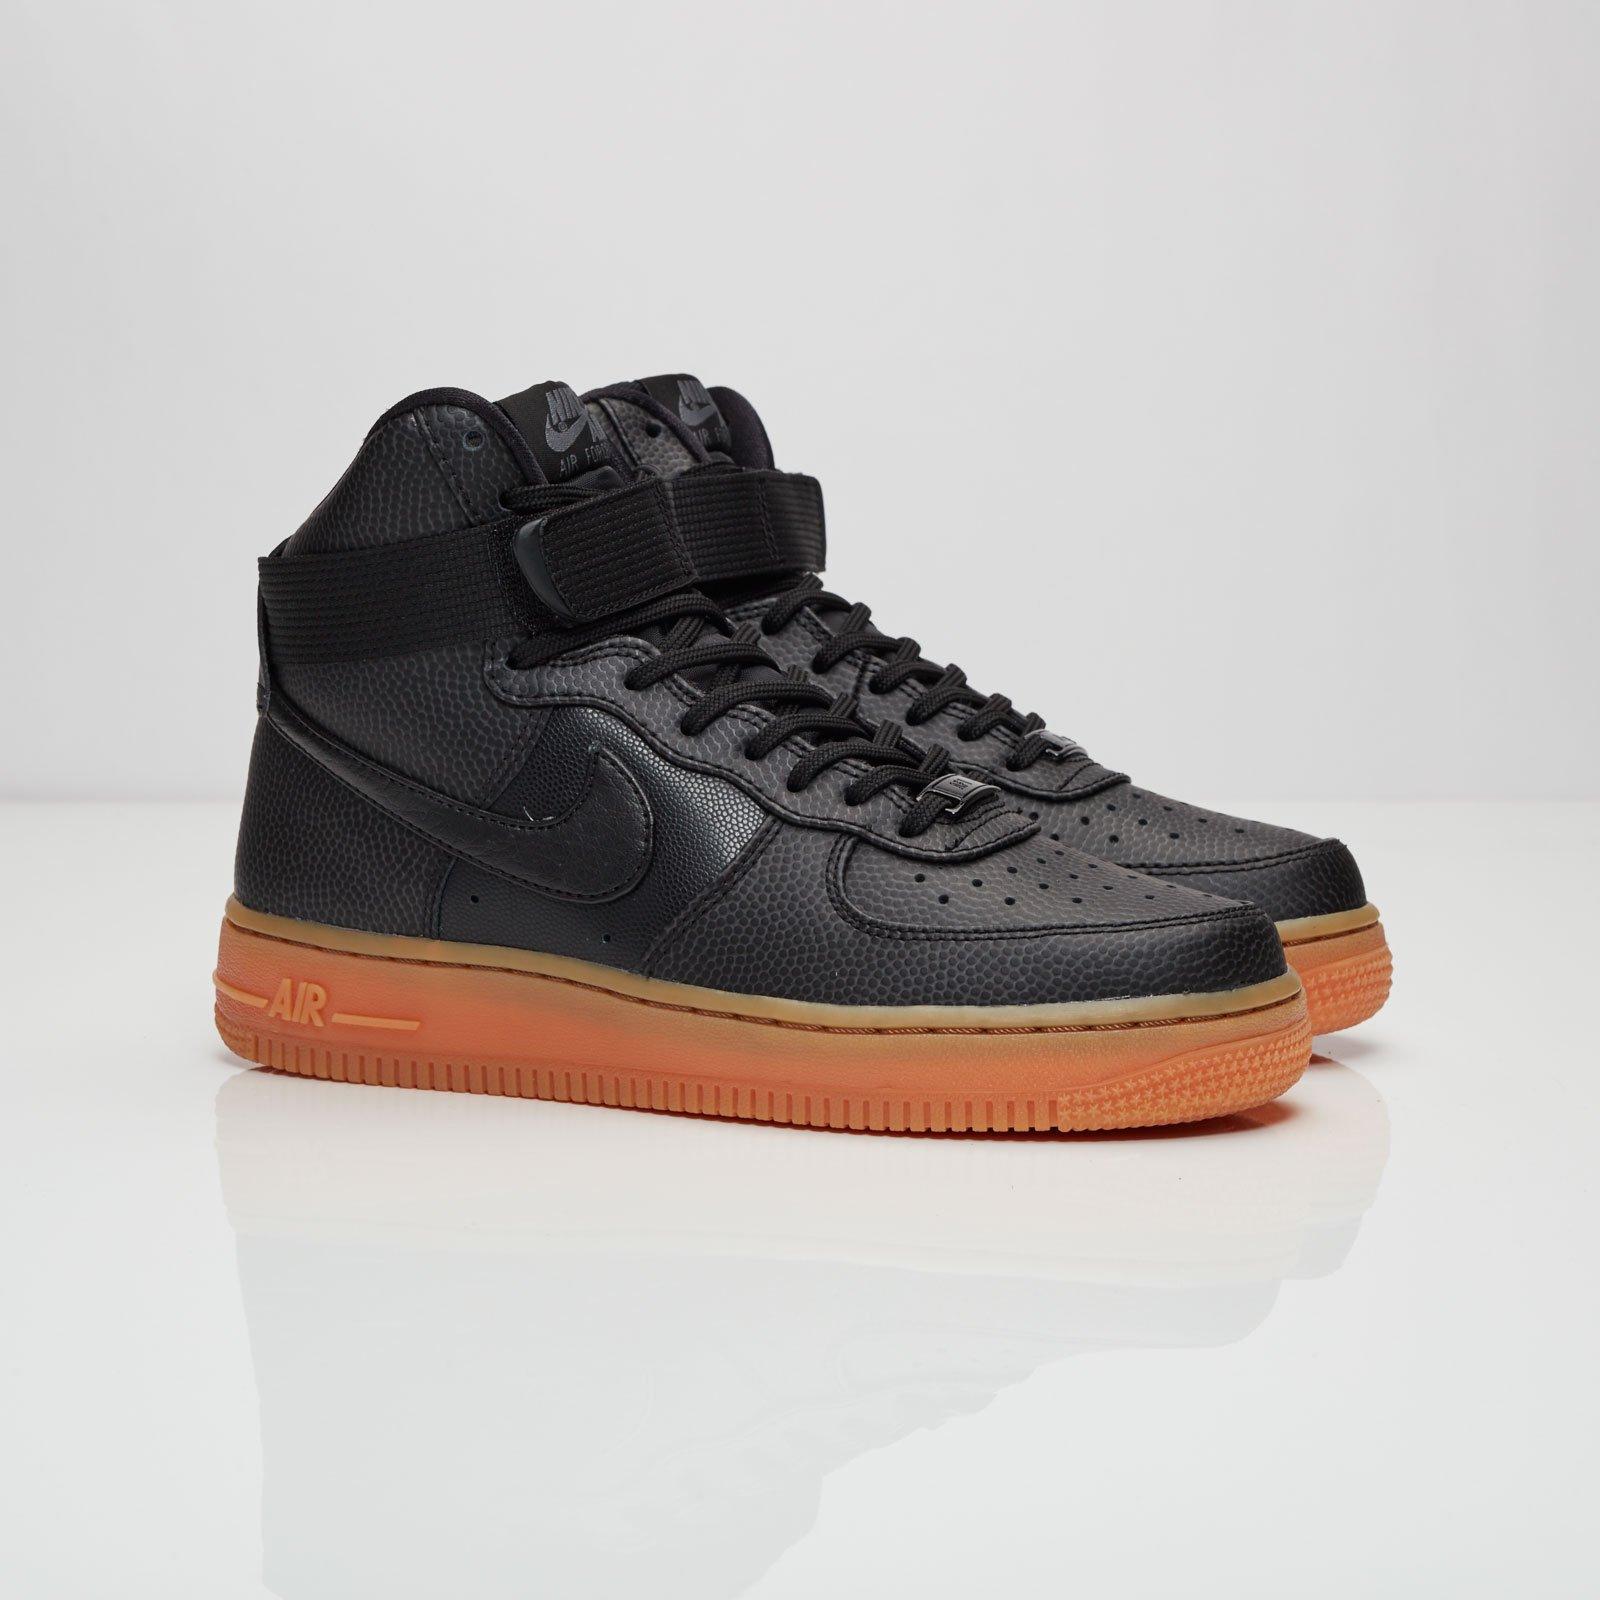 Nike Wmns Air Force 1 Hi SE 860544 002 Sneakersnstuff